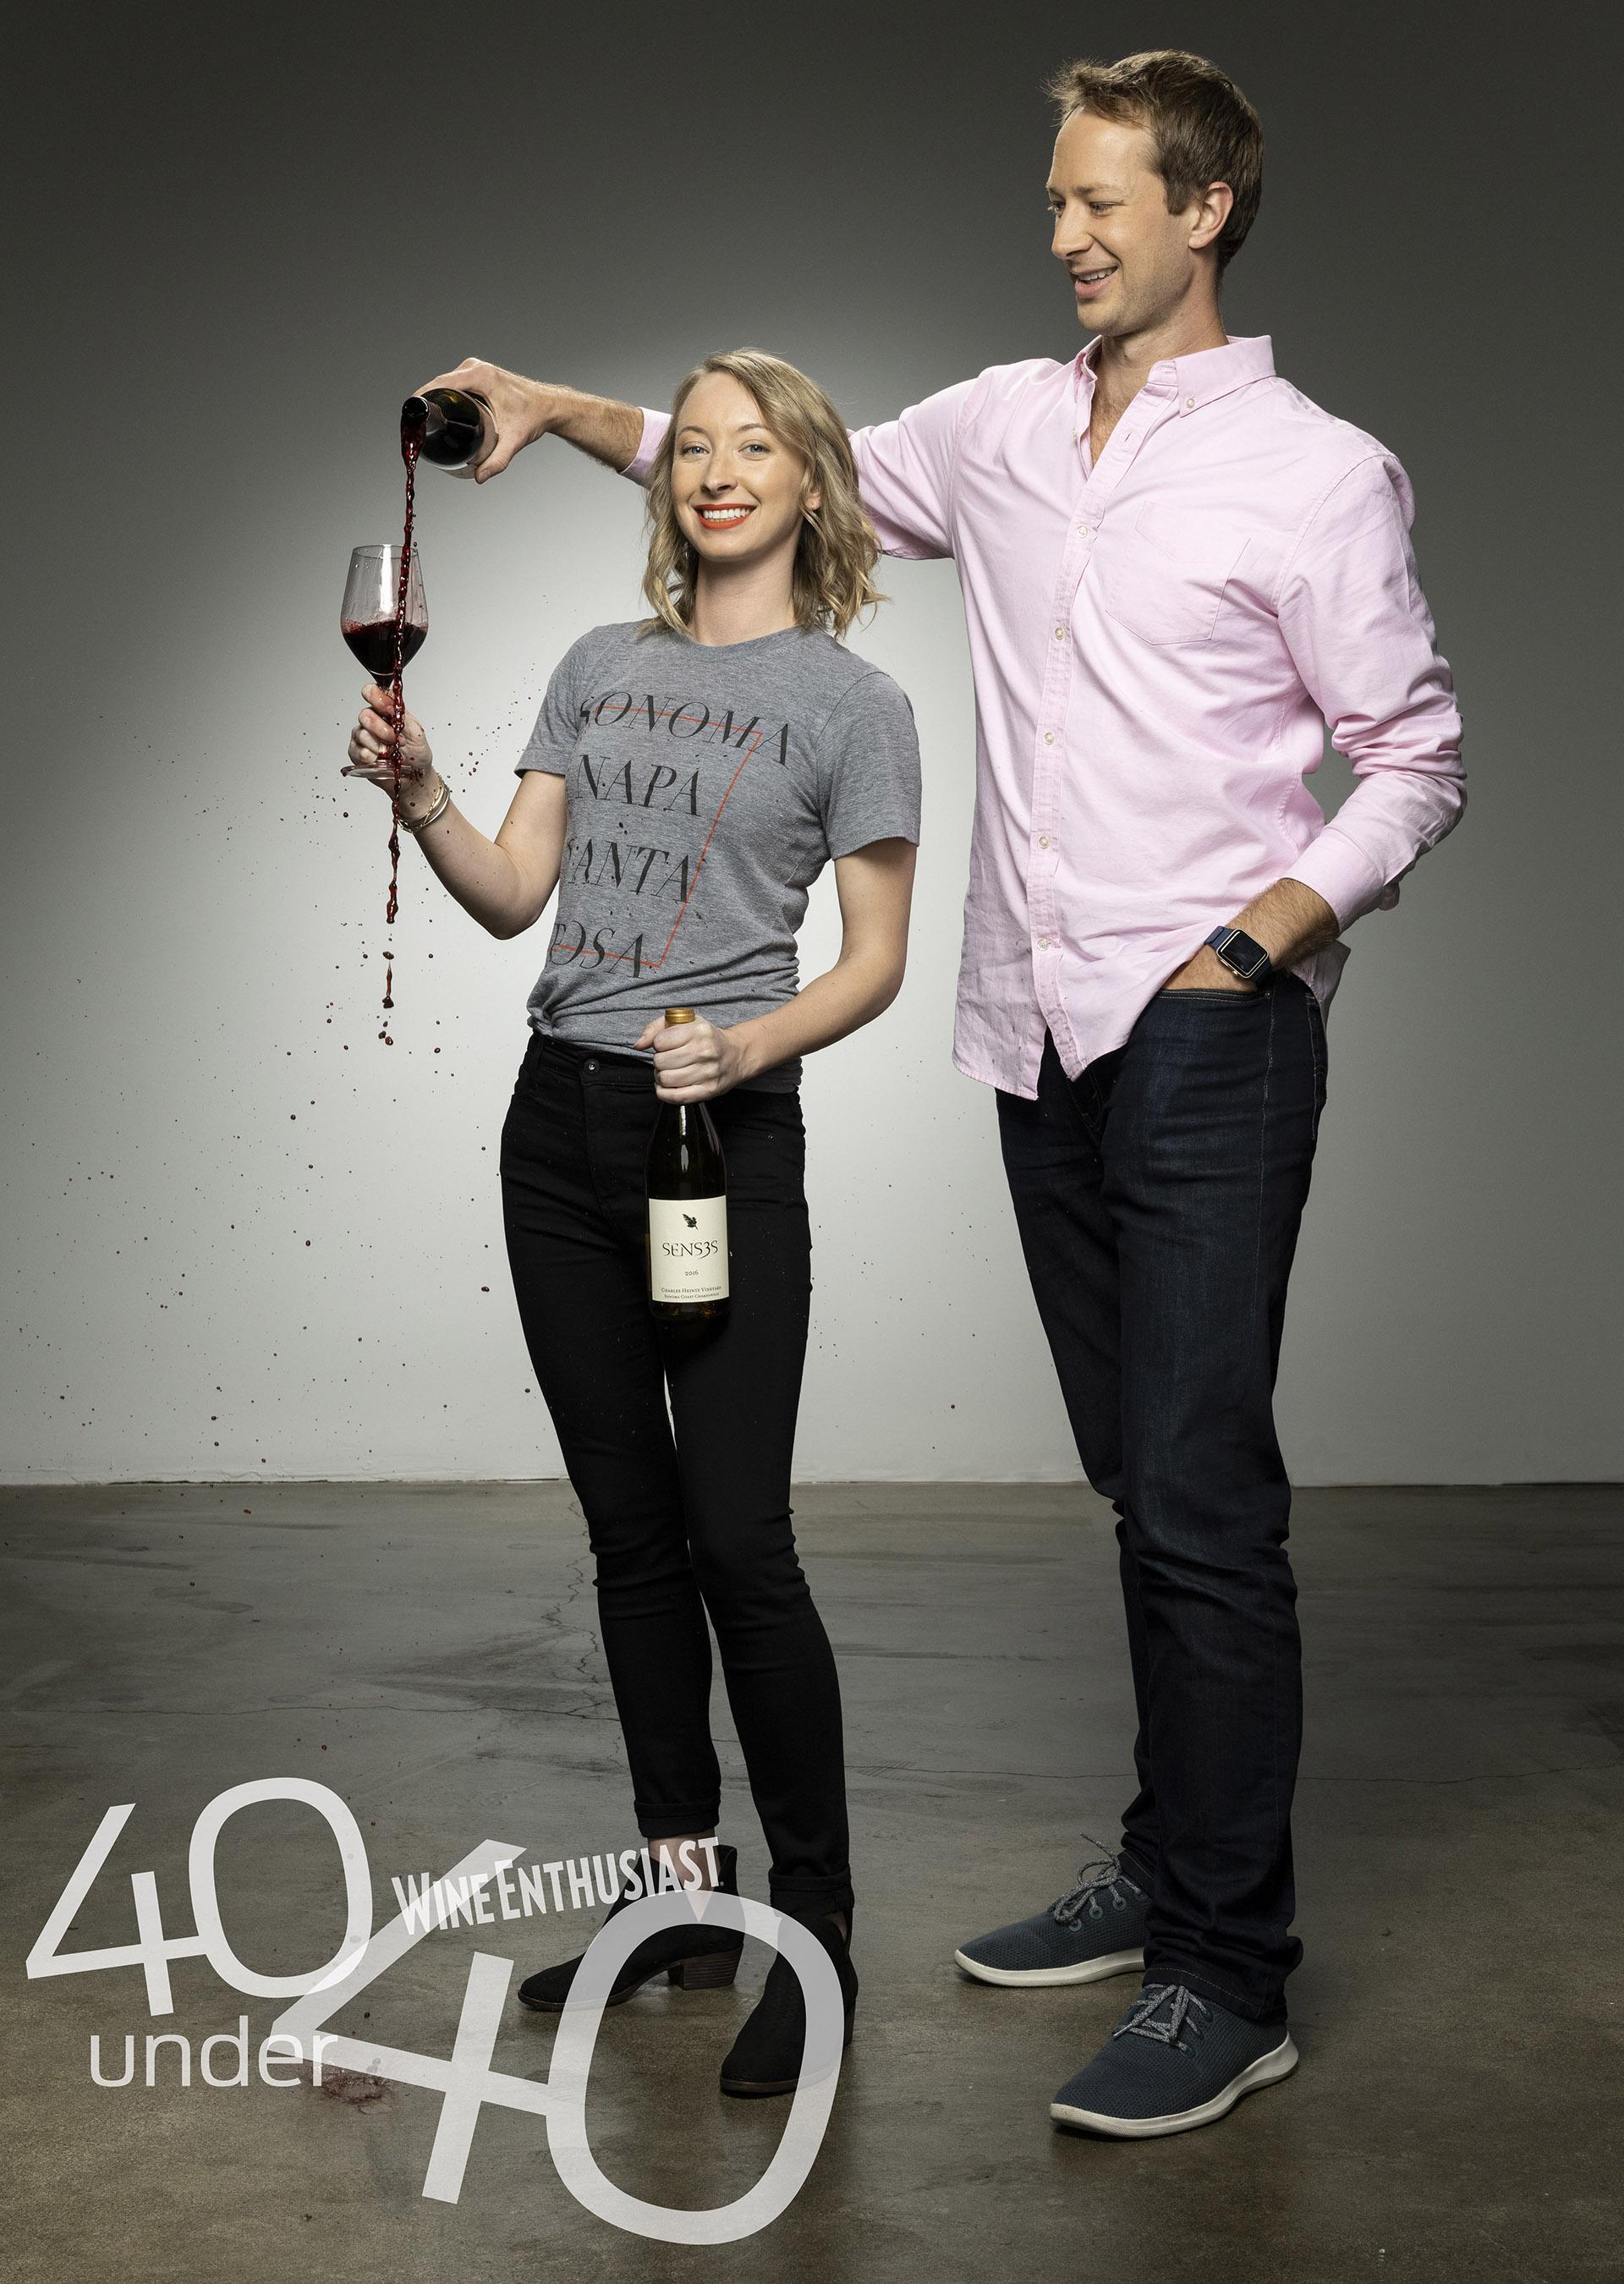 Wine Enthusiast   Top 40 Under 40, 2018   August 21, 2018   Image by Scott McDermott